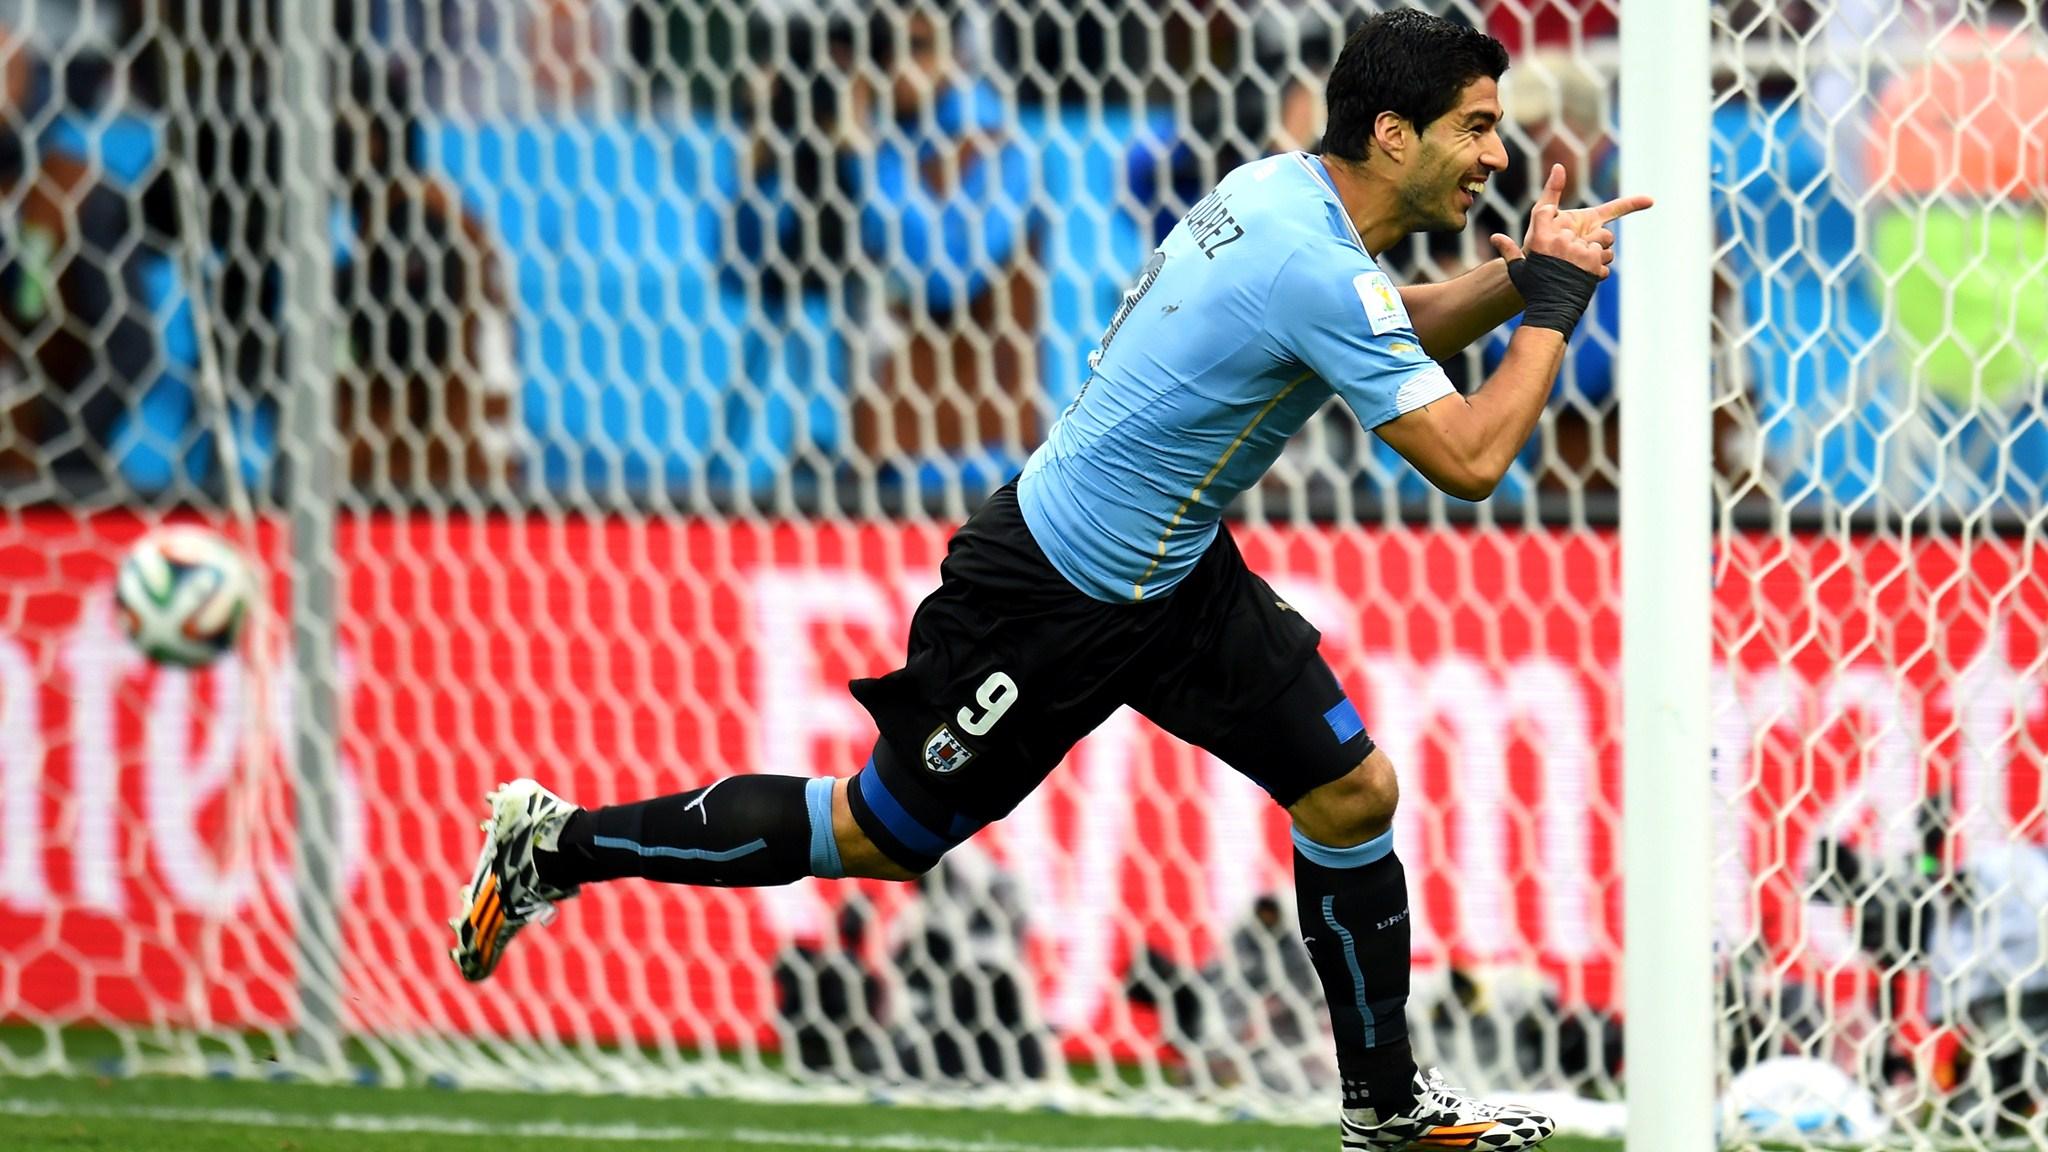 Uruguay-England 2-1 / 19 Jun 2014 - 16-00 / Sao Paulo - Aren